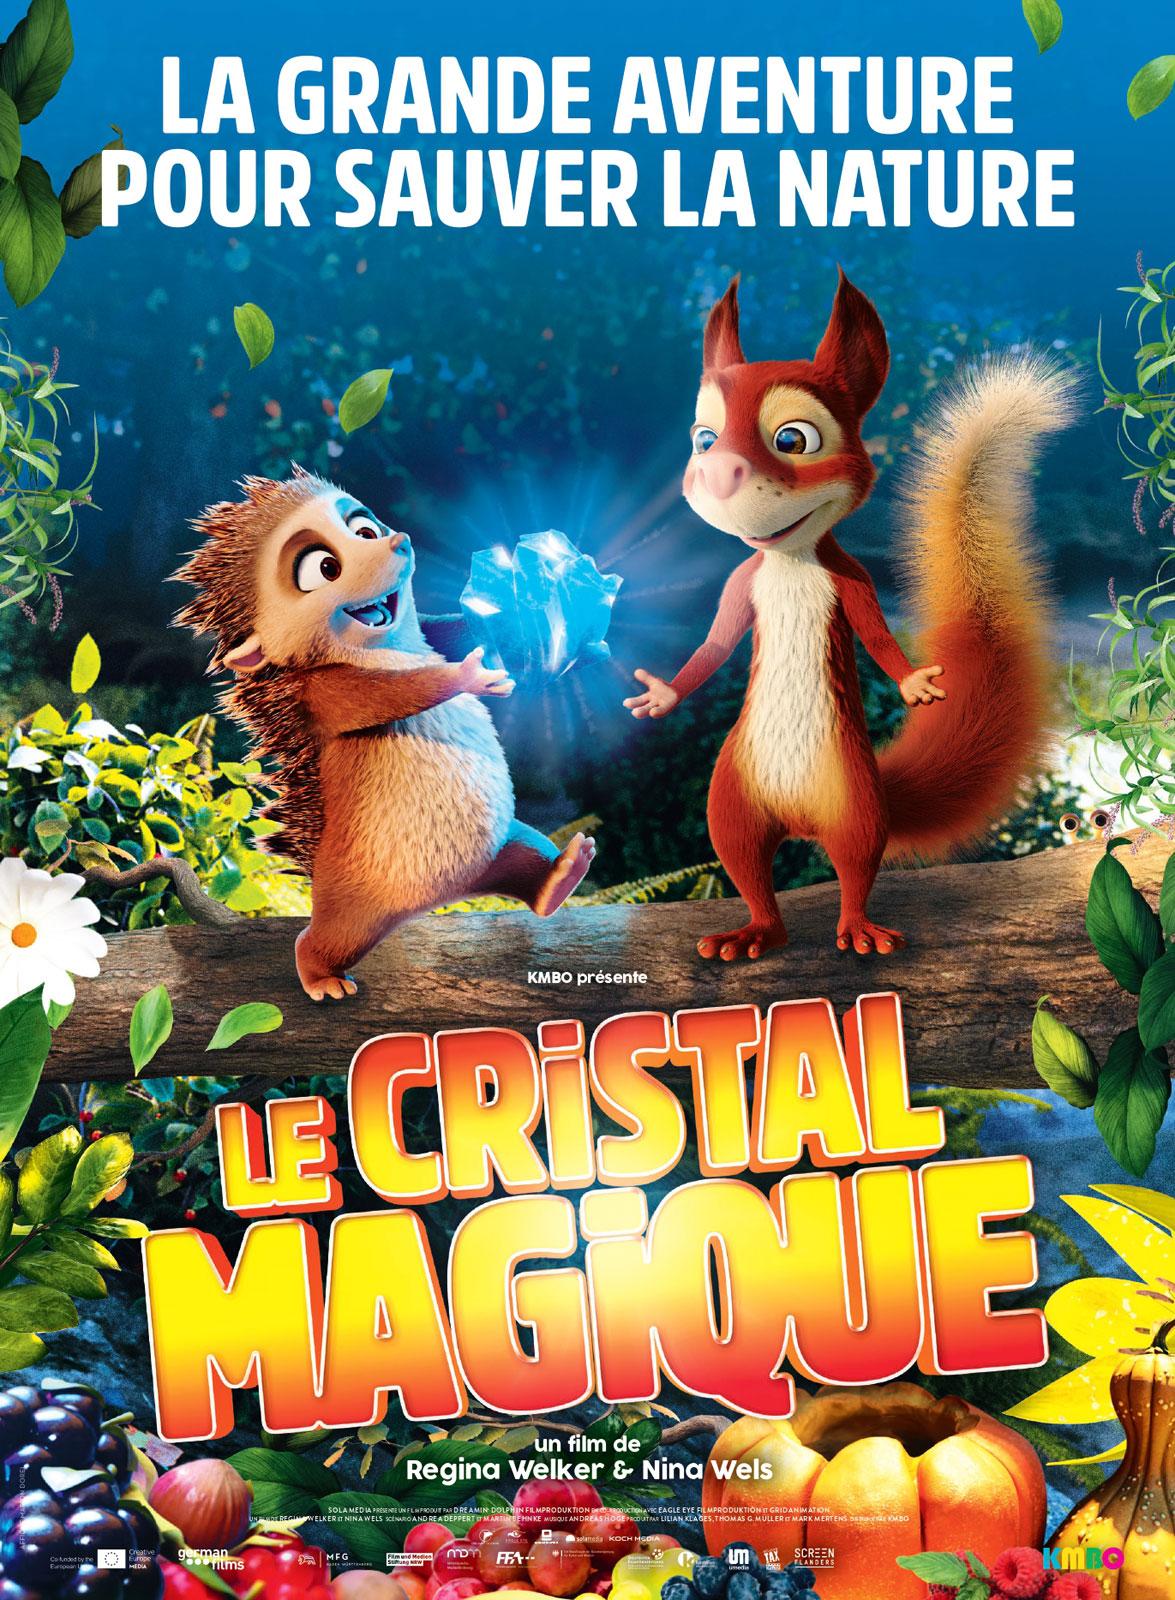 http://rss.allocine.fr/~r/ac/cine/cettesemaine/~3/RSwbtlWbIlo/fichefilm_gen_cfilm=262921.html